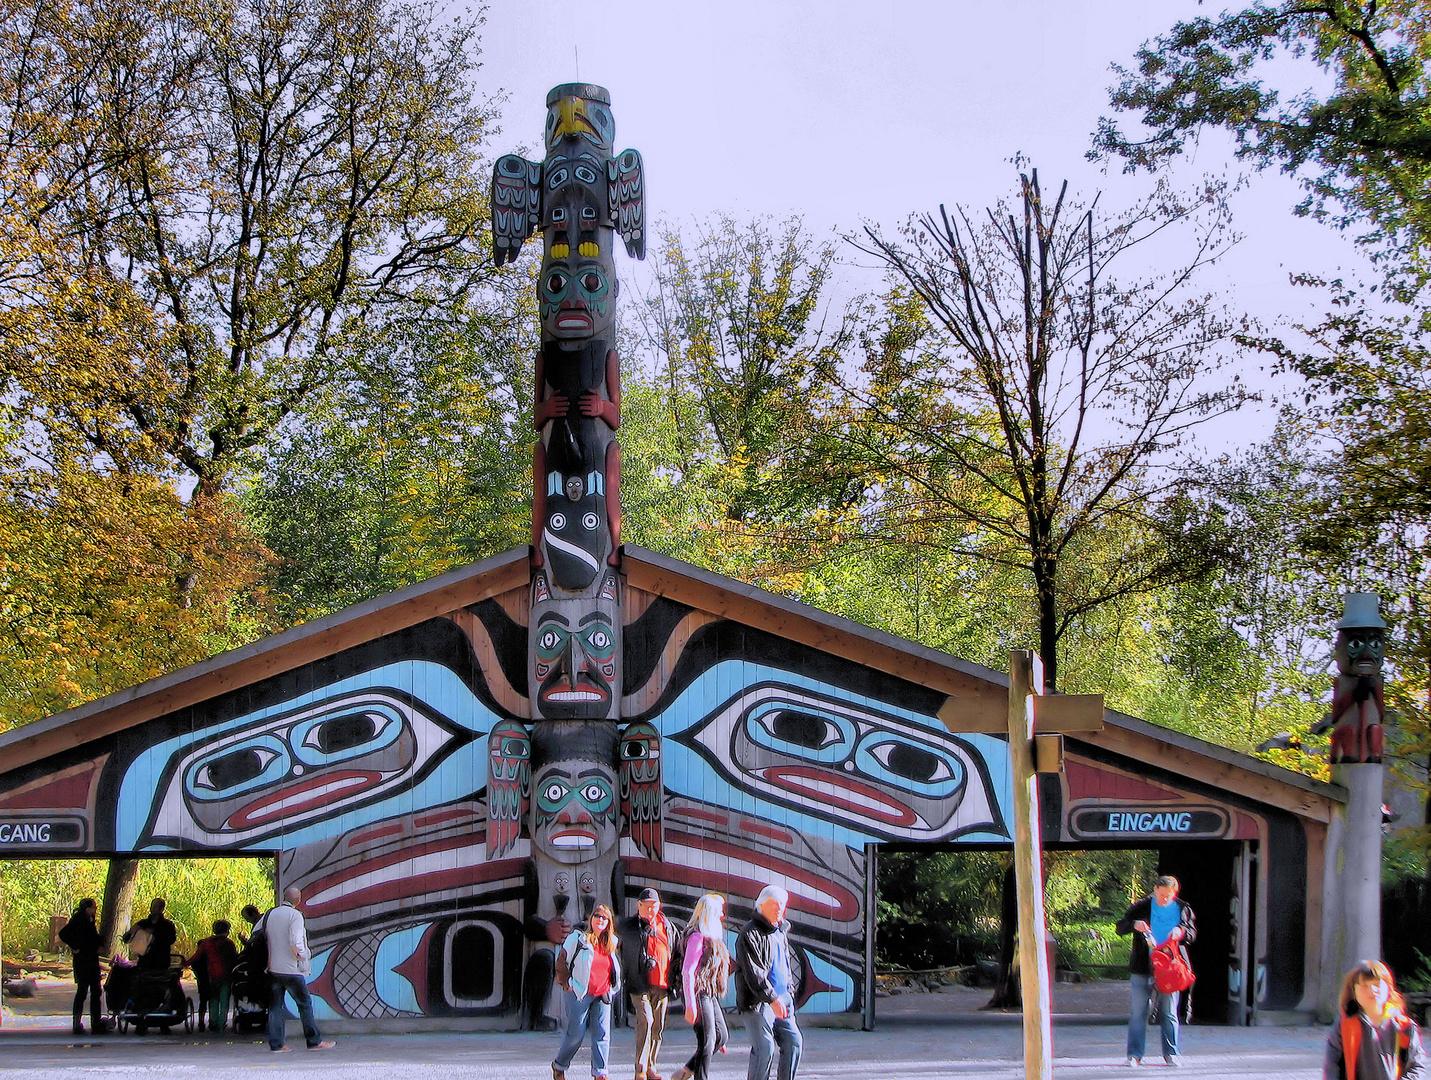 Eingang zum Zoo in Gelsenkirchen